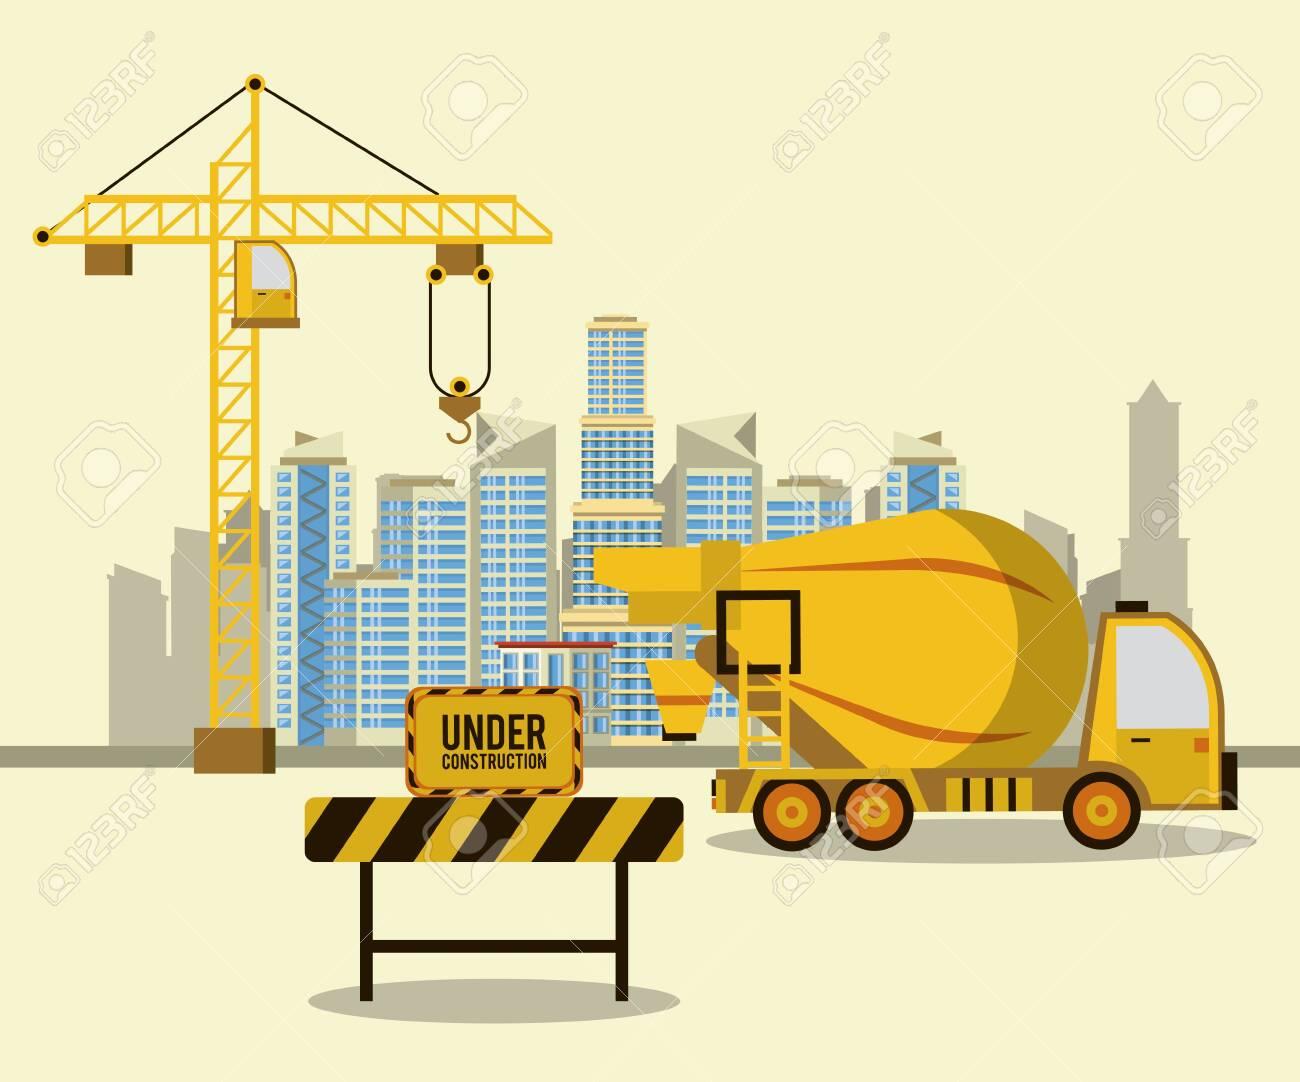 Cement truck in construction zone scenery vector illustration graphic design - 130769373